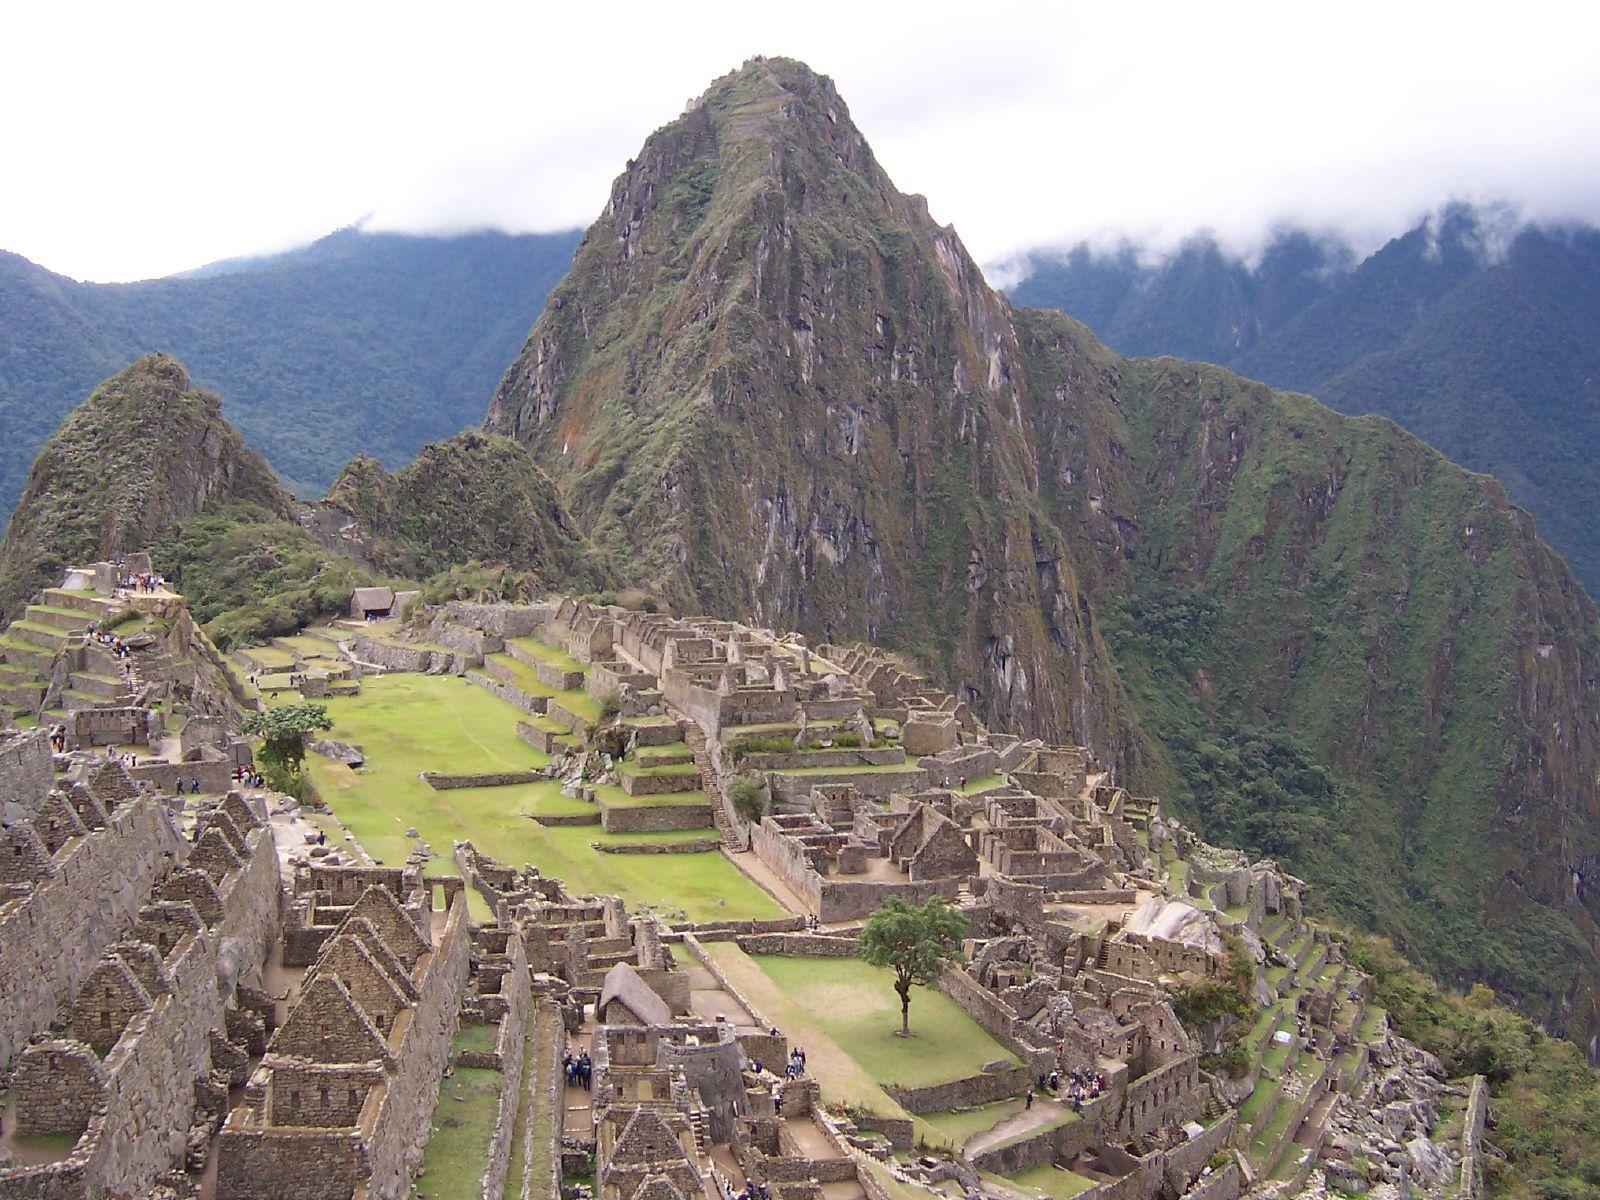 Machu_Picchu_general_view.jpg (1600×1200)